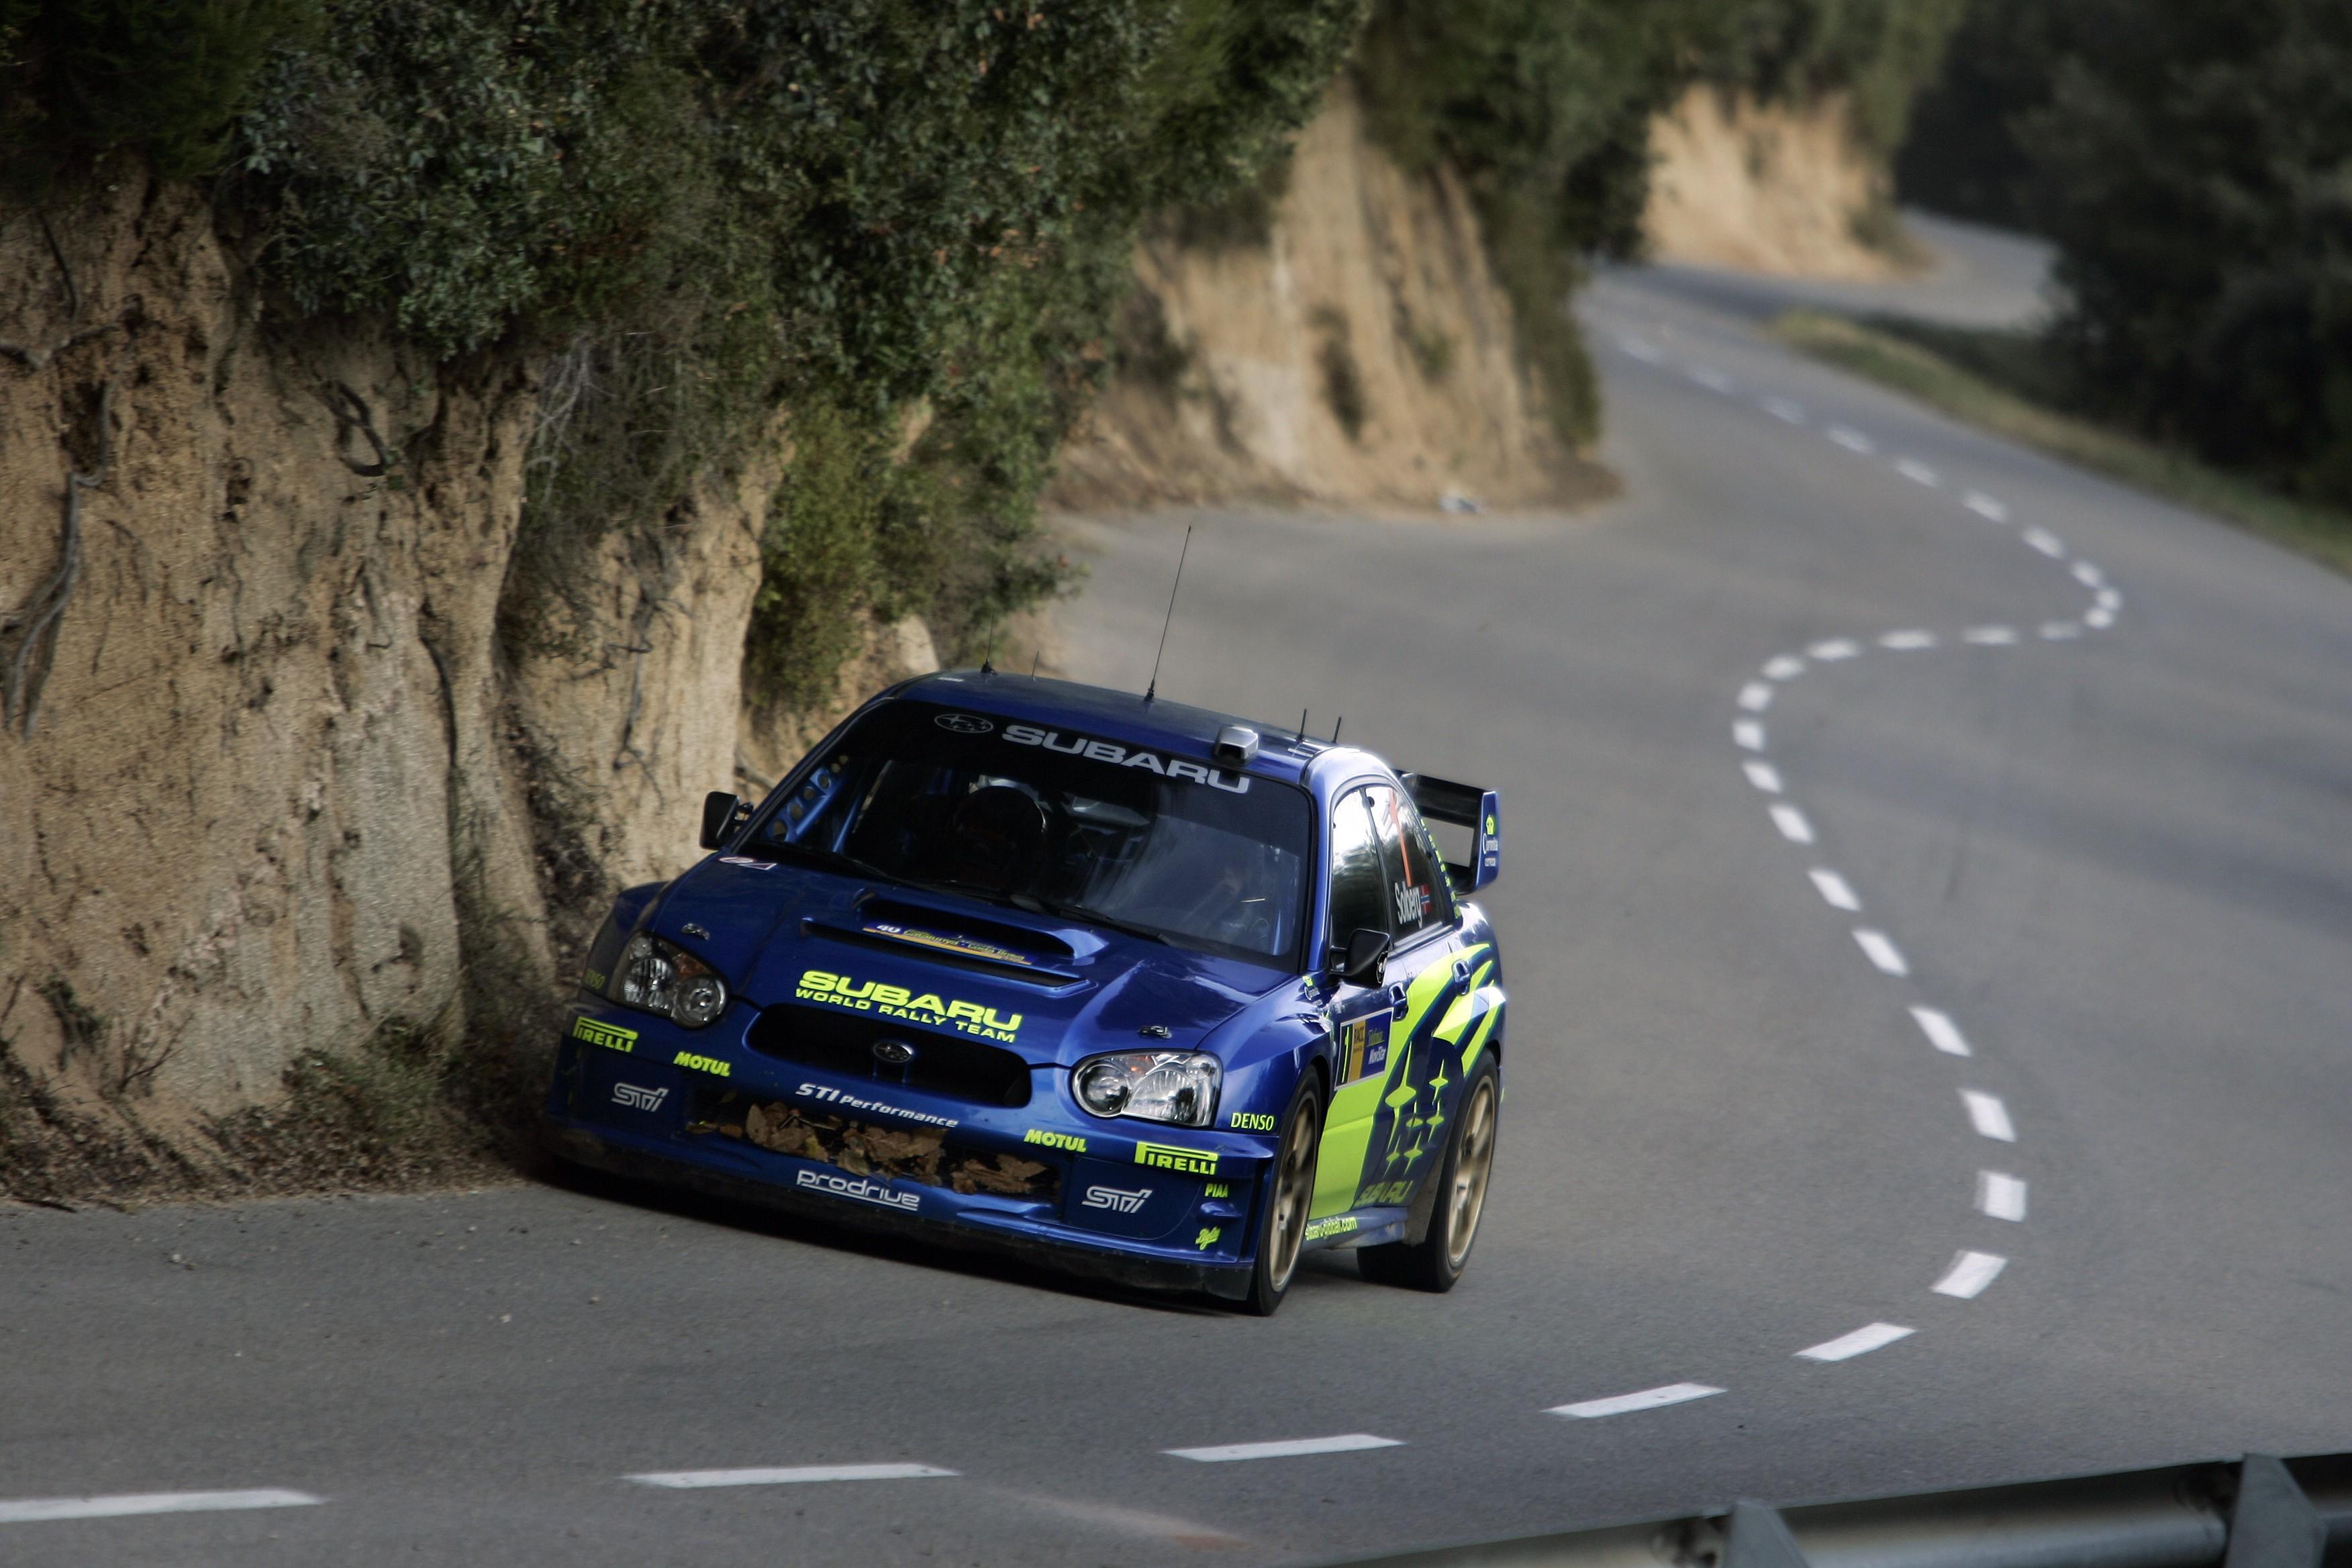 Wallpaper Sports Car Rally Cars Subaru Impreza Wrx Sti Asphalt